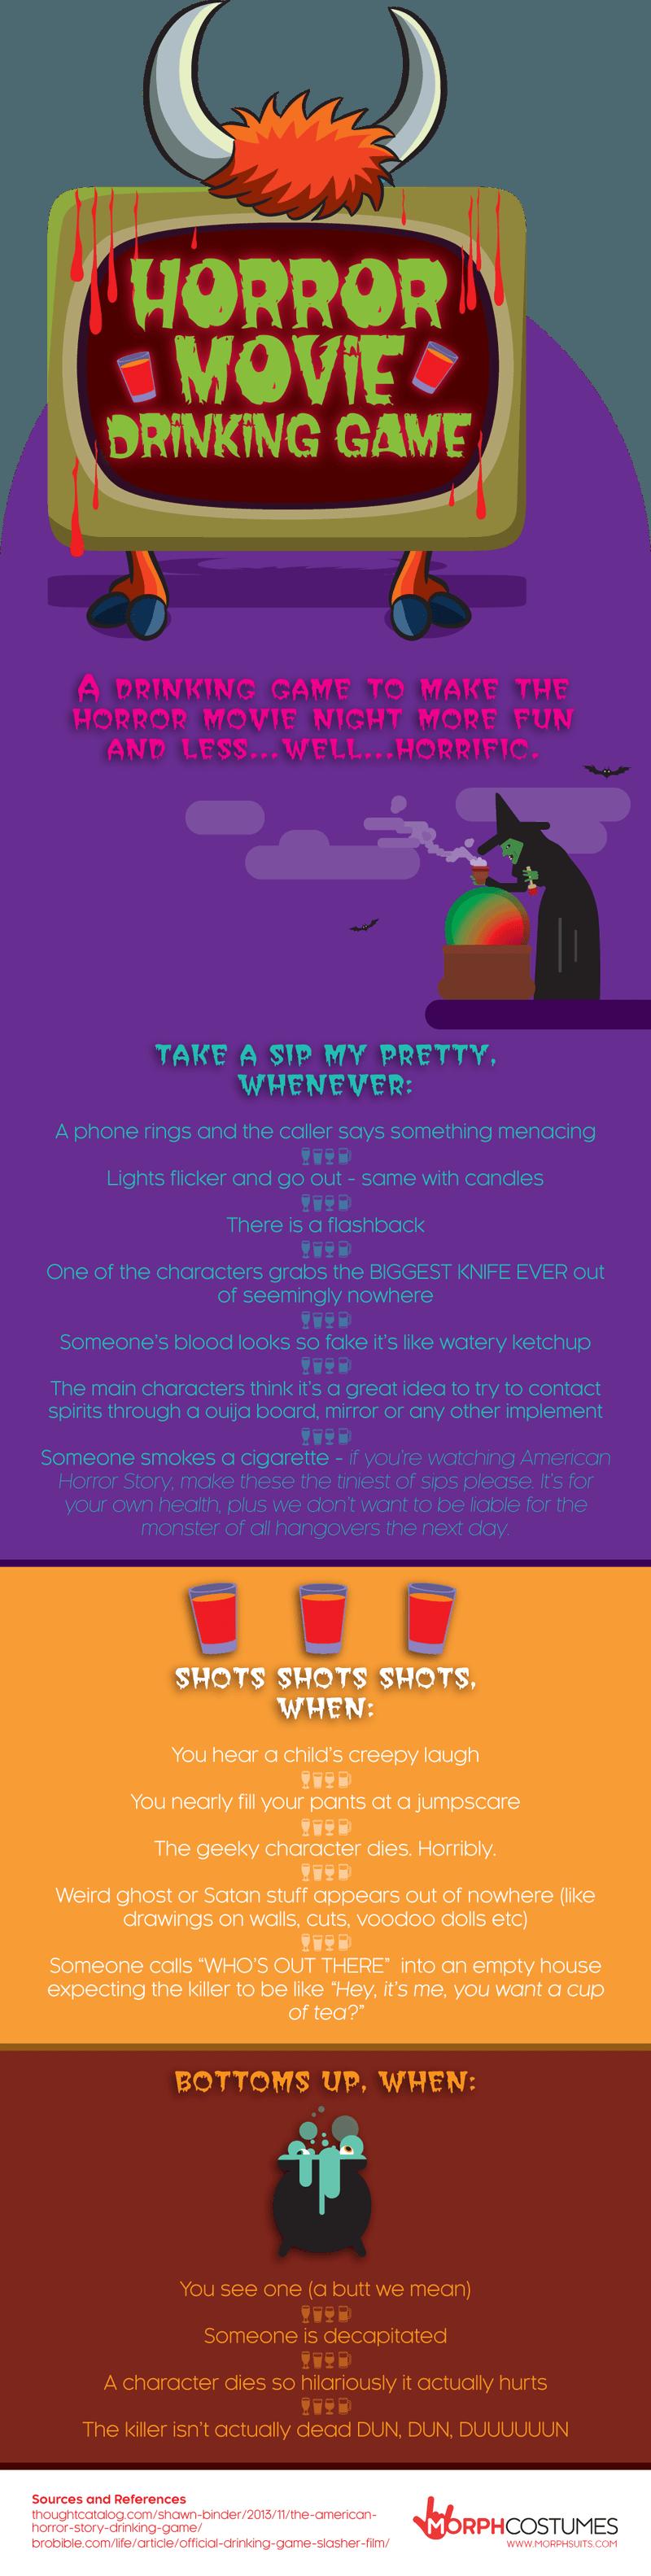 horror movie drinking game ig